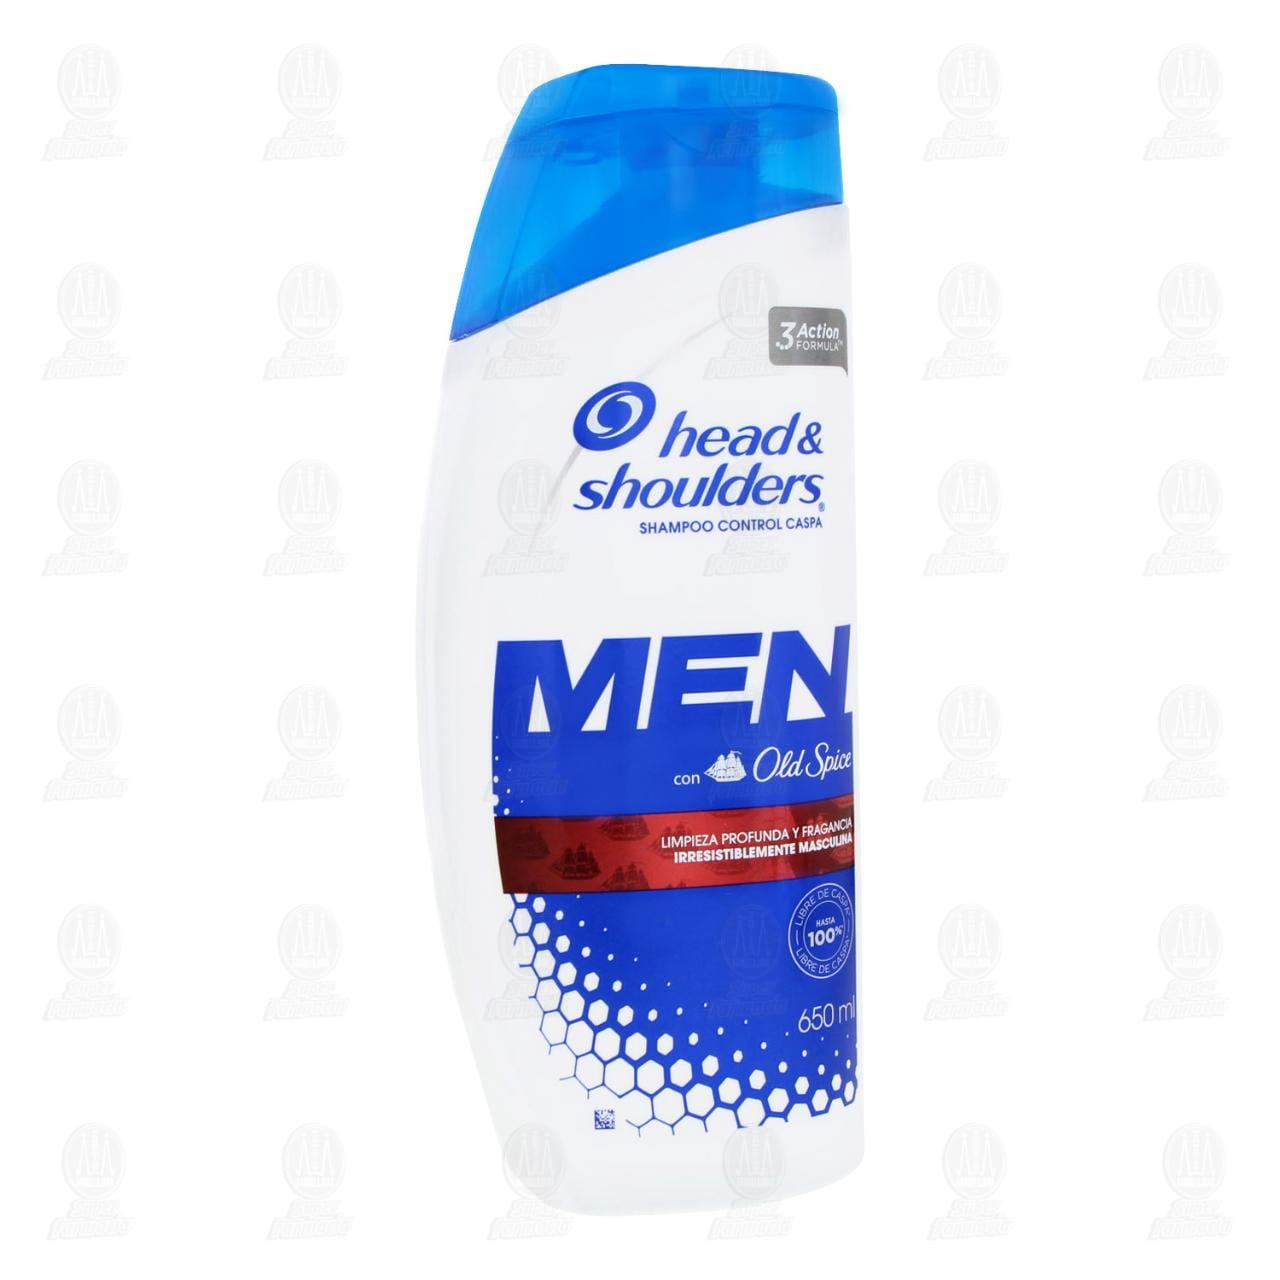 Comprar Shampoo Head & Shoulders Control Caspa Men, 650 ml. en Farmacias Guadalajara